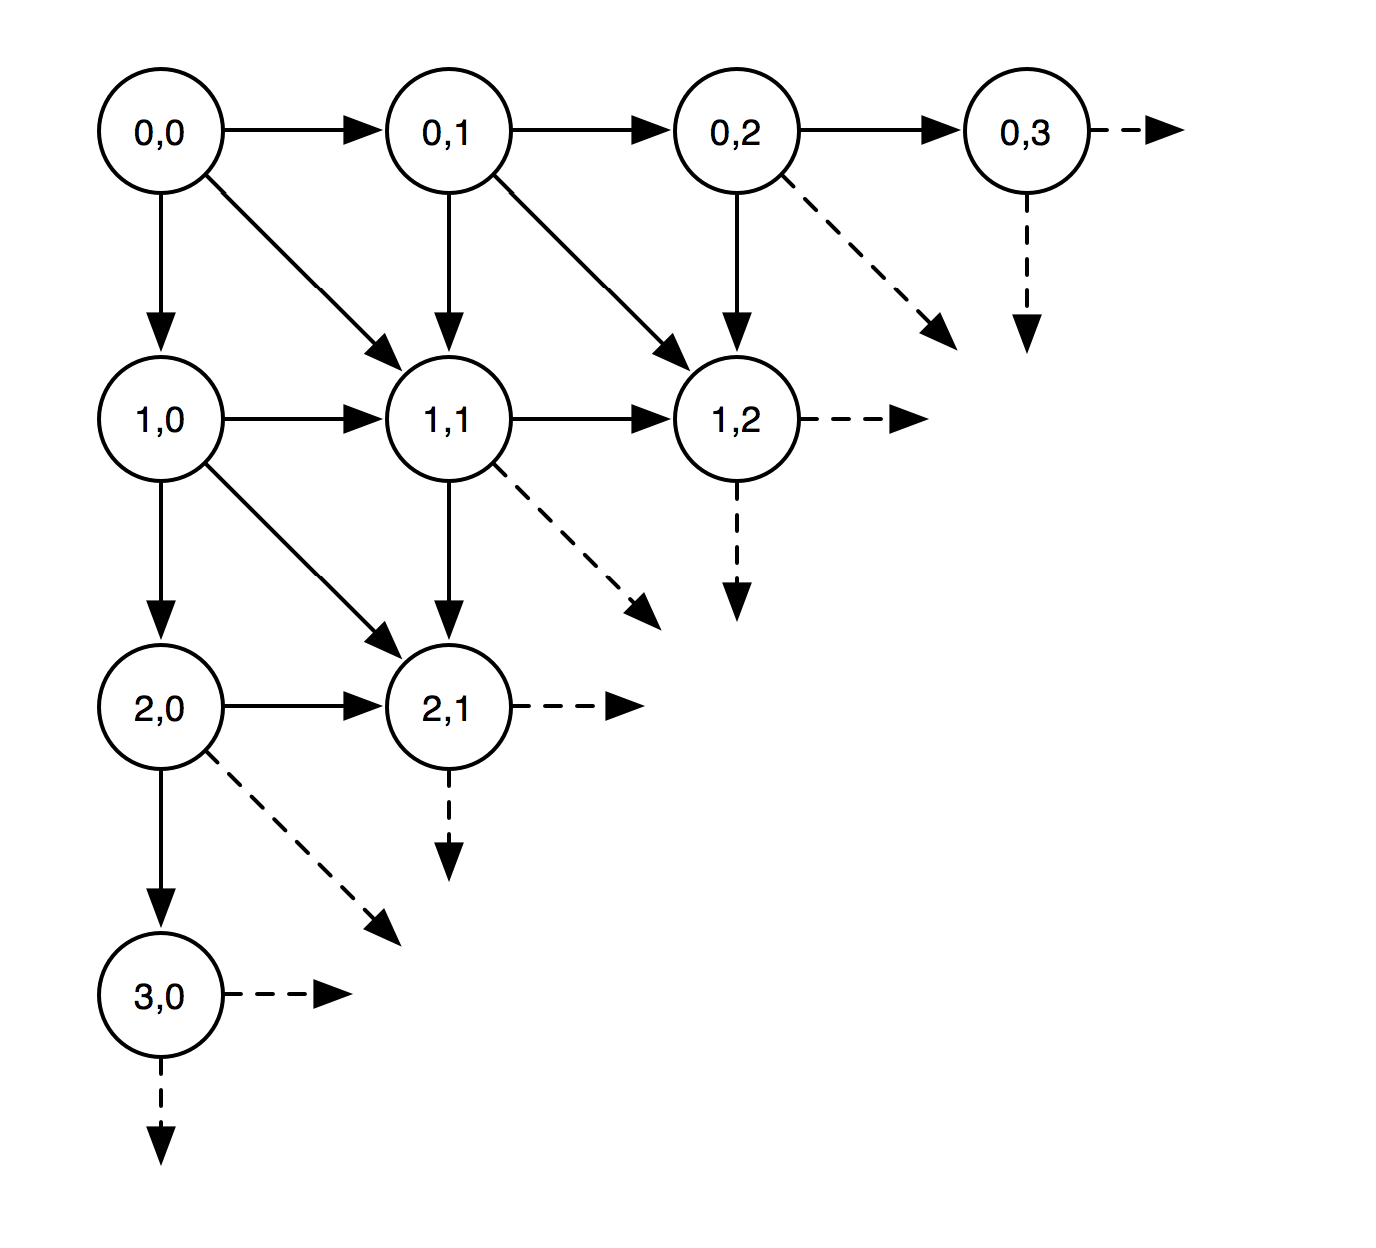 Designing A Tree Diff Algorithm Using Dynamic Programming